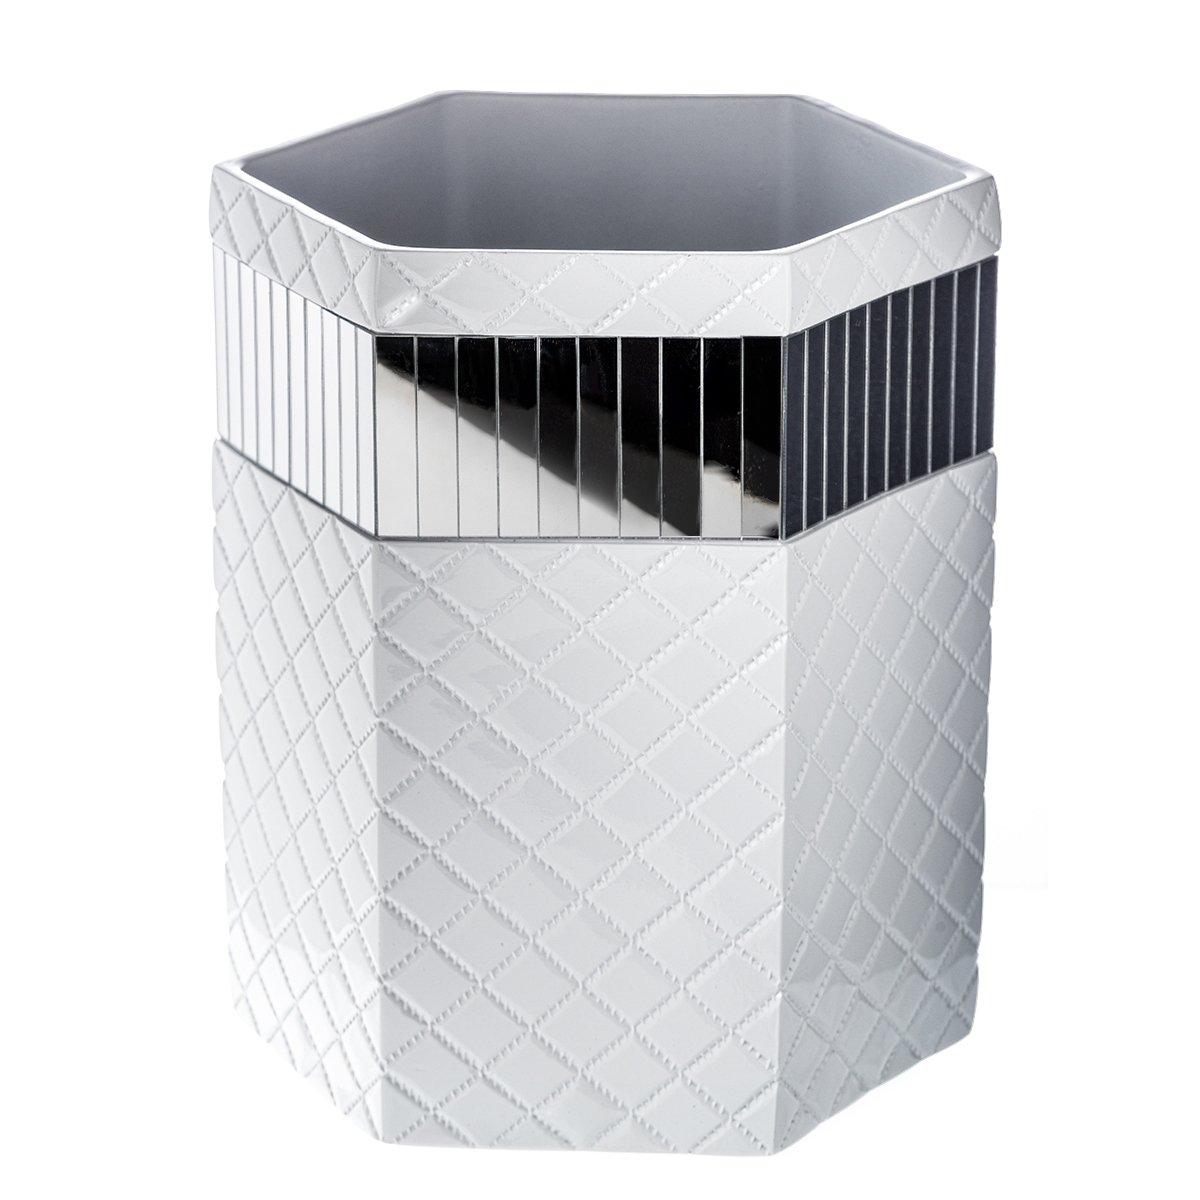 Quilted Mirror Bathroom Trash Can (8.1'' x 7 x 9.8'') - Decorative Wastebasket- Durable Waste Paper Baskets Design- Space Friendly Bath Rubbish Dust Bin- for Elegant Shower Décor by Creative Scents